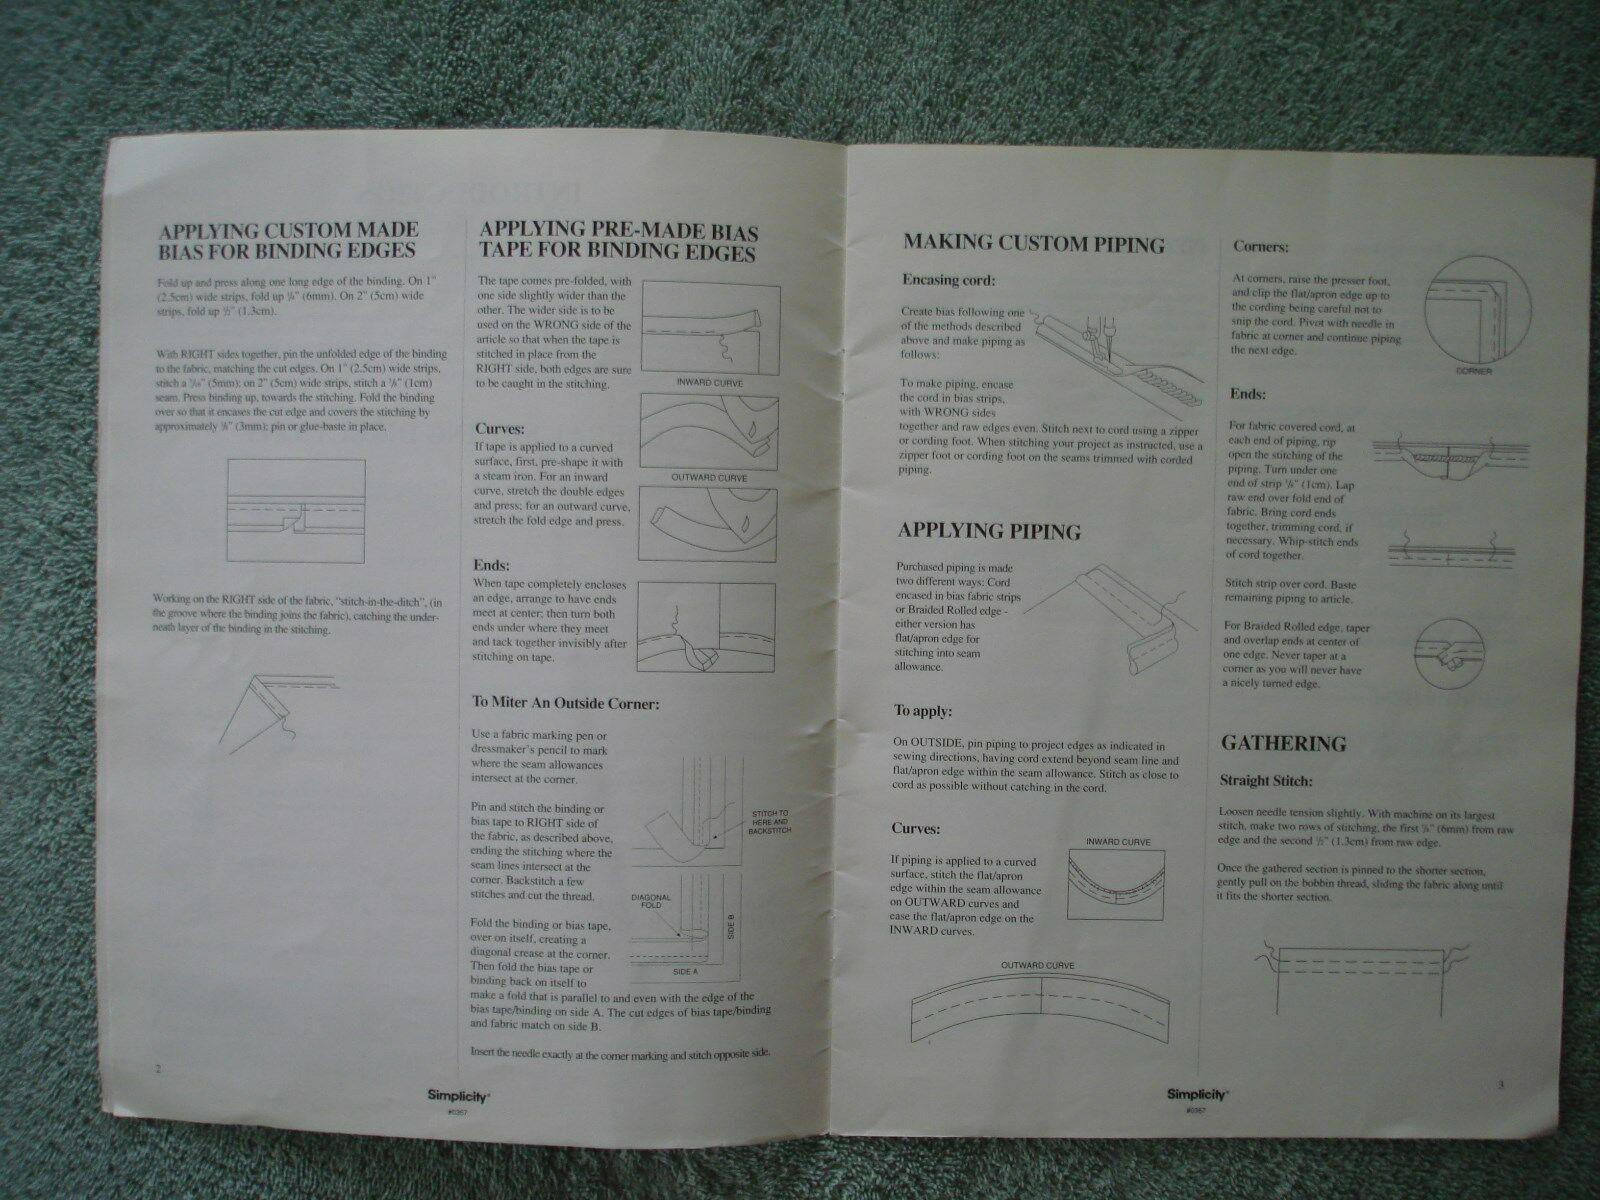 Vtg 1993 Simplicity DECOR Bedding Basics Instructional Pillows Comforters Duvets image 6